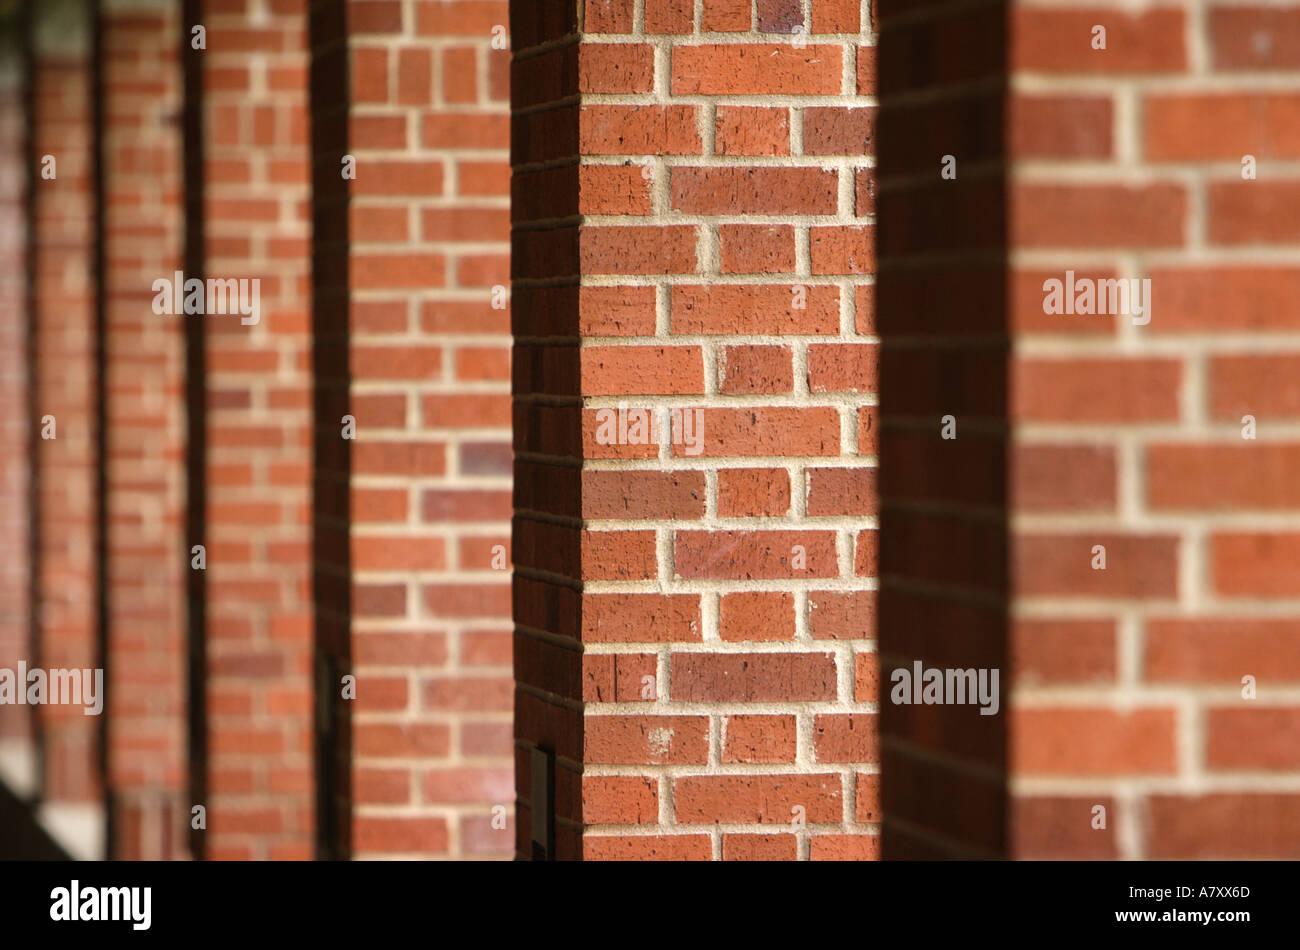 Brick Pillars - Stock Image